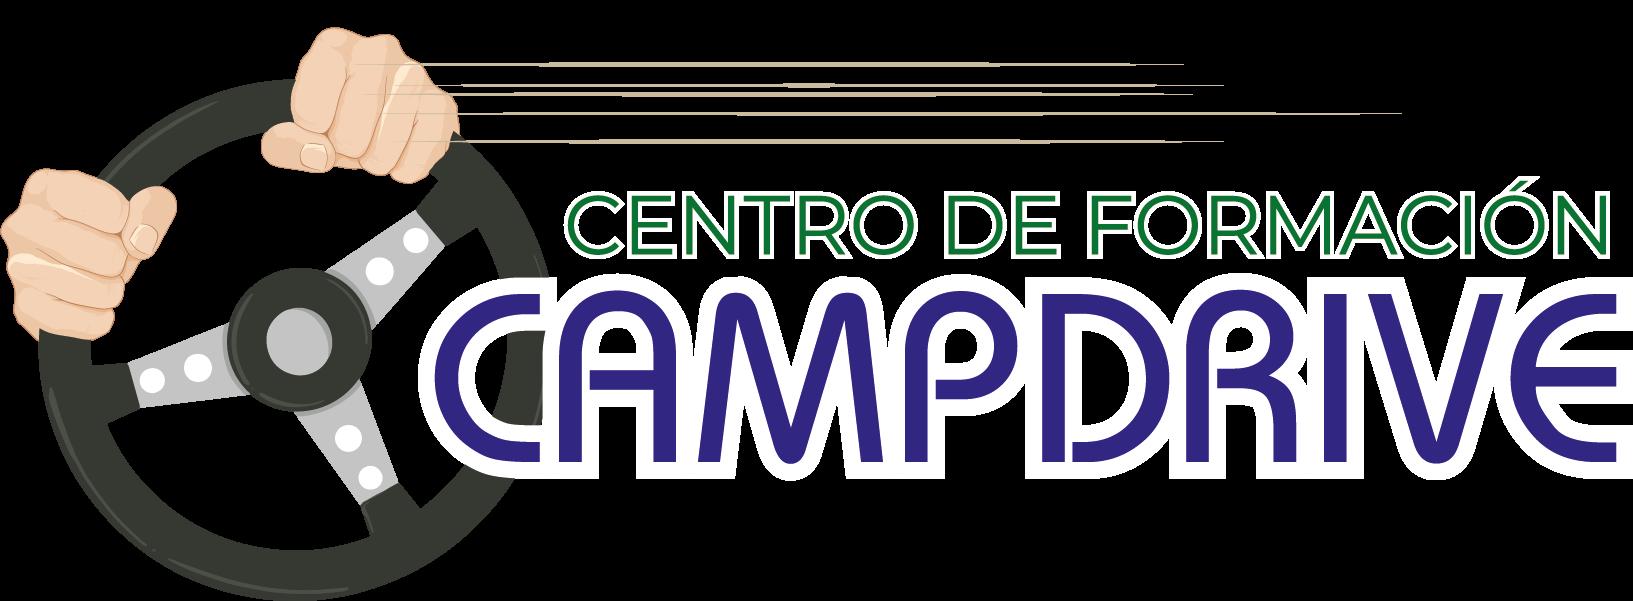 Autoescuela Campdrive